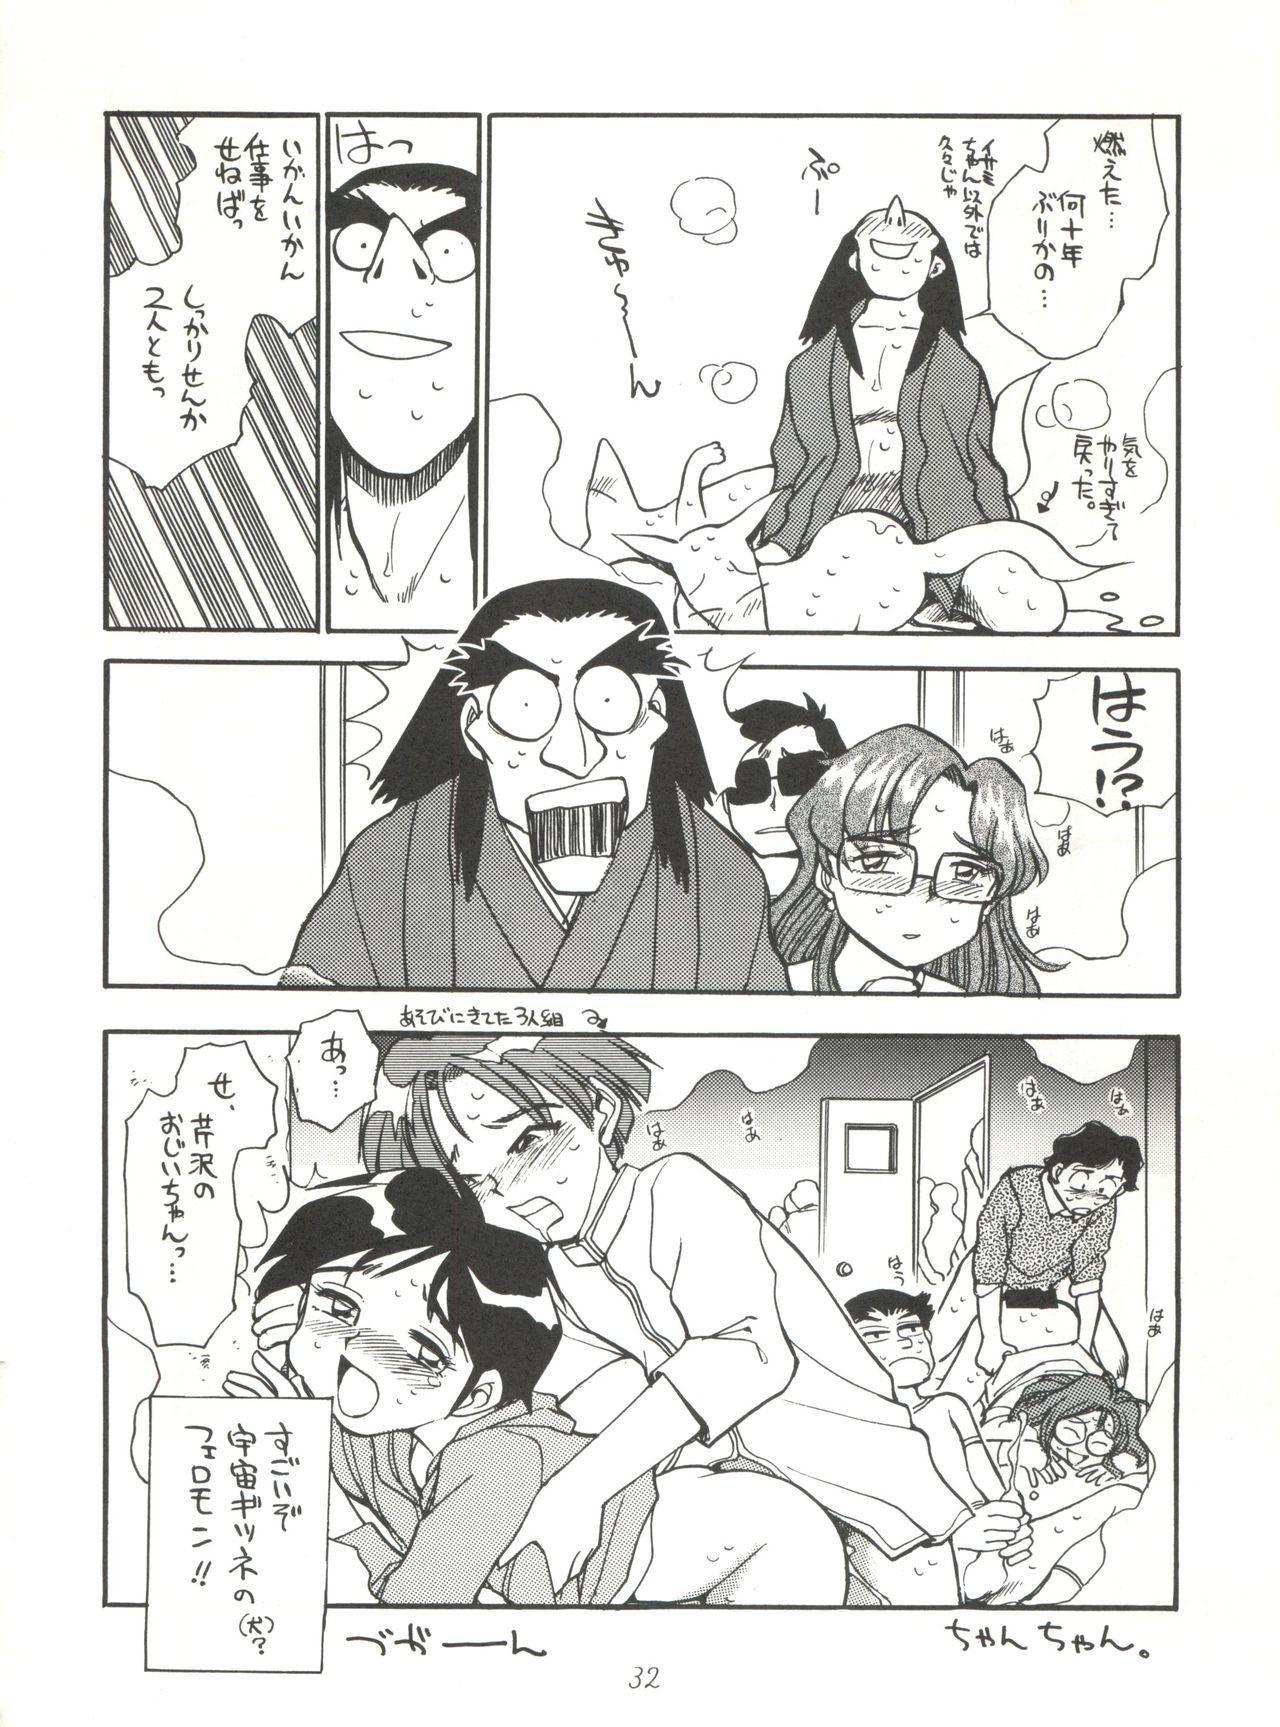 Heart o Migakukkya Nai 31